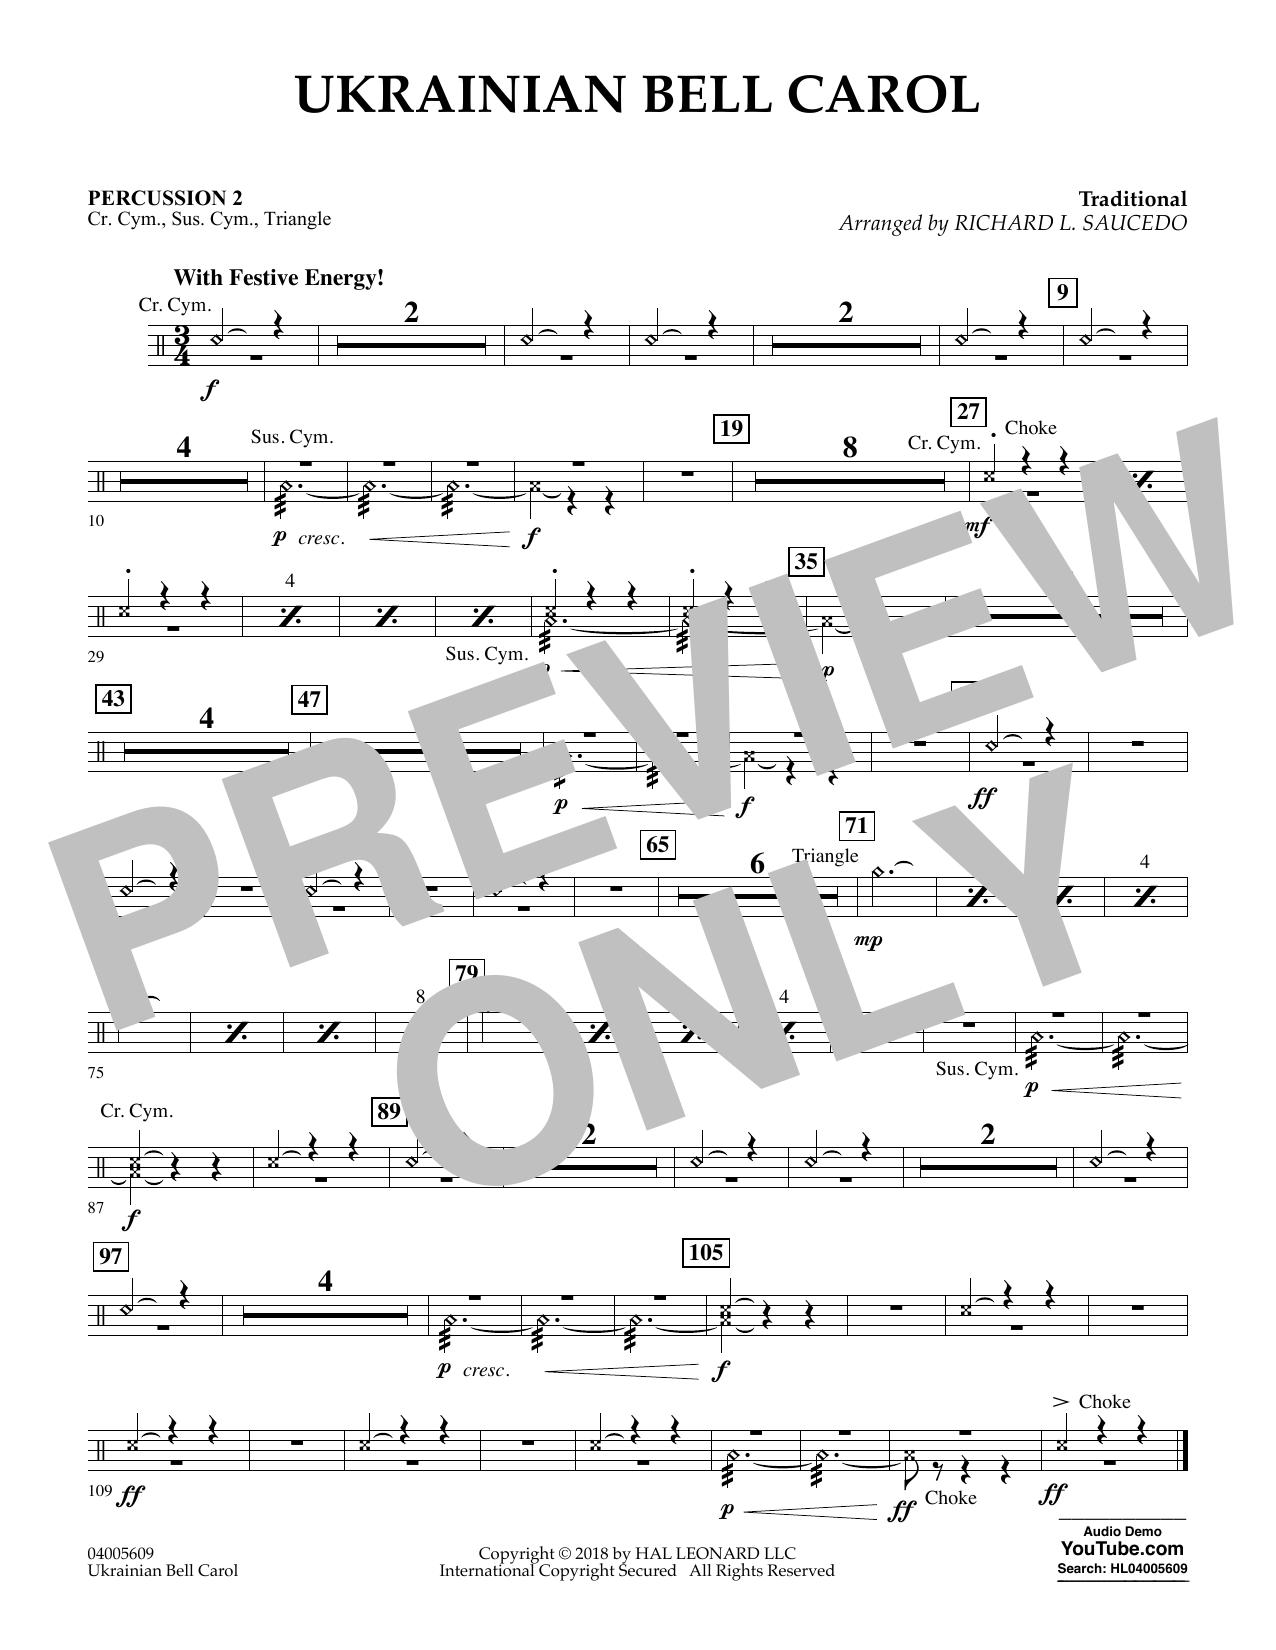 Ukrainian Bell Carol - Percussion 2 (Concert Band)